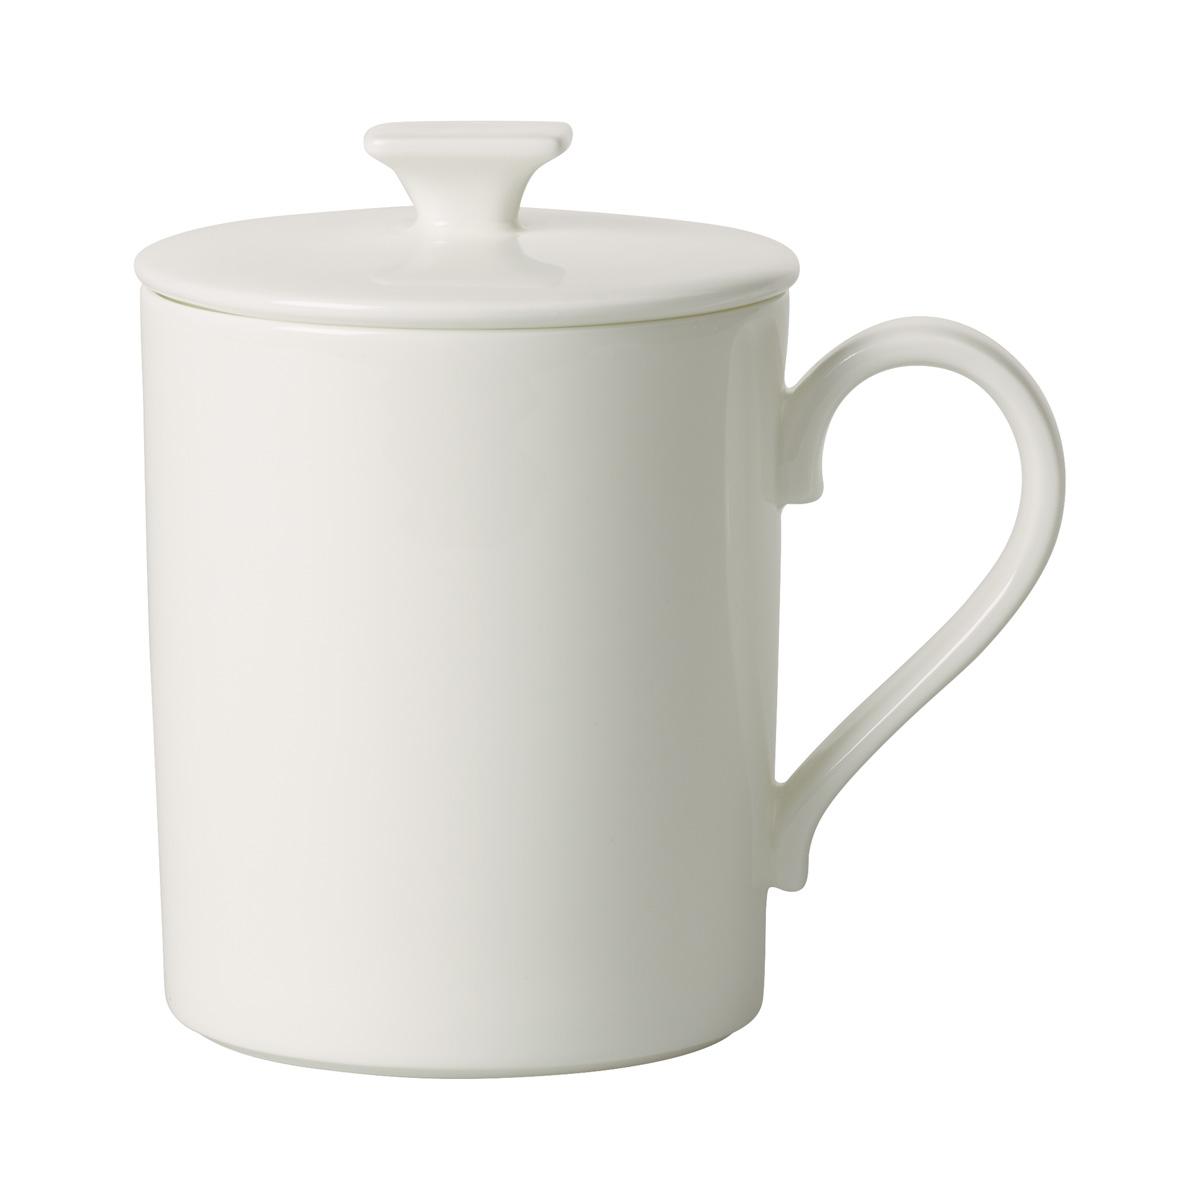 Villeroy and Boch MetroChic Blanc Mug with Lid